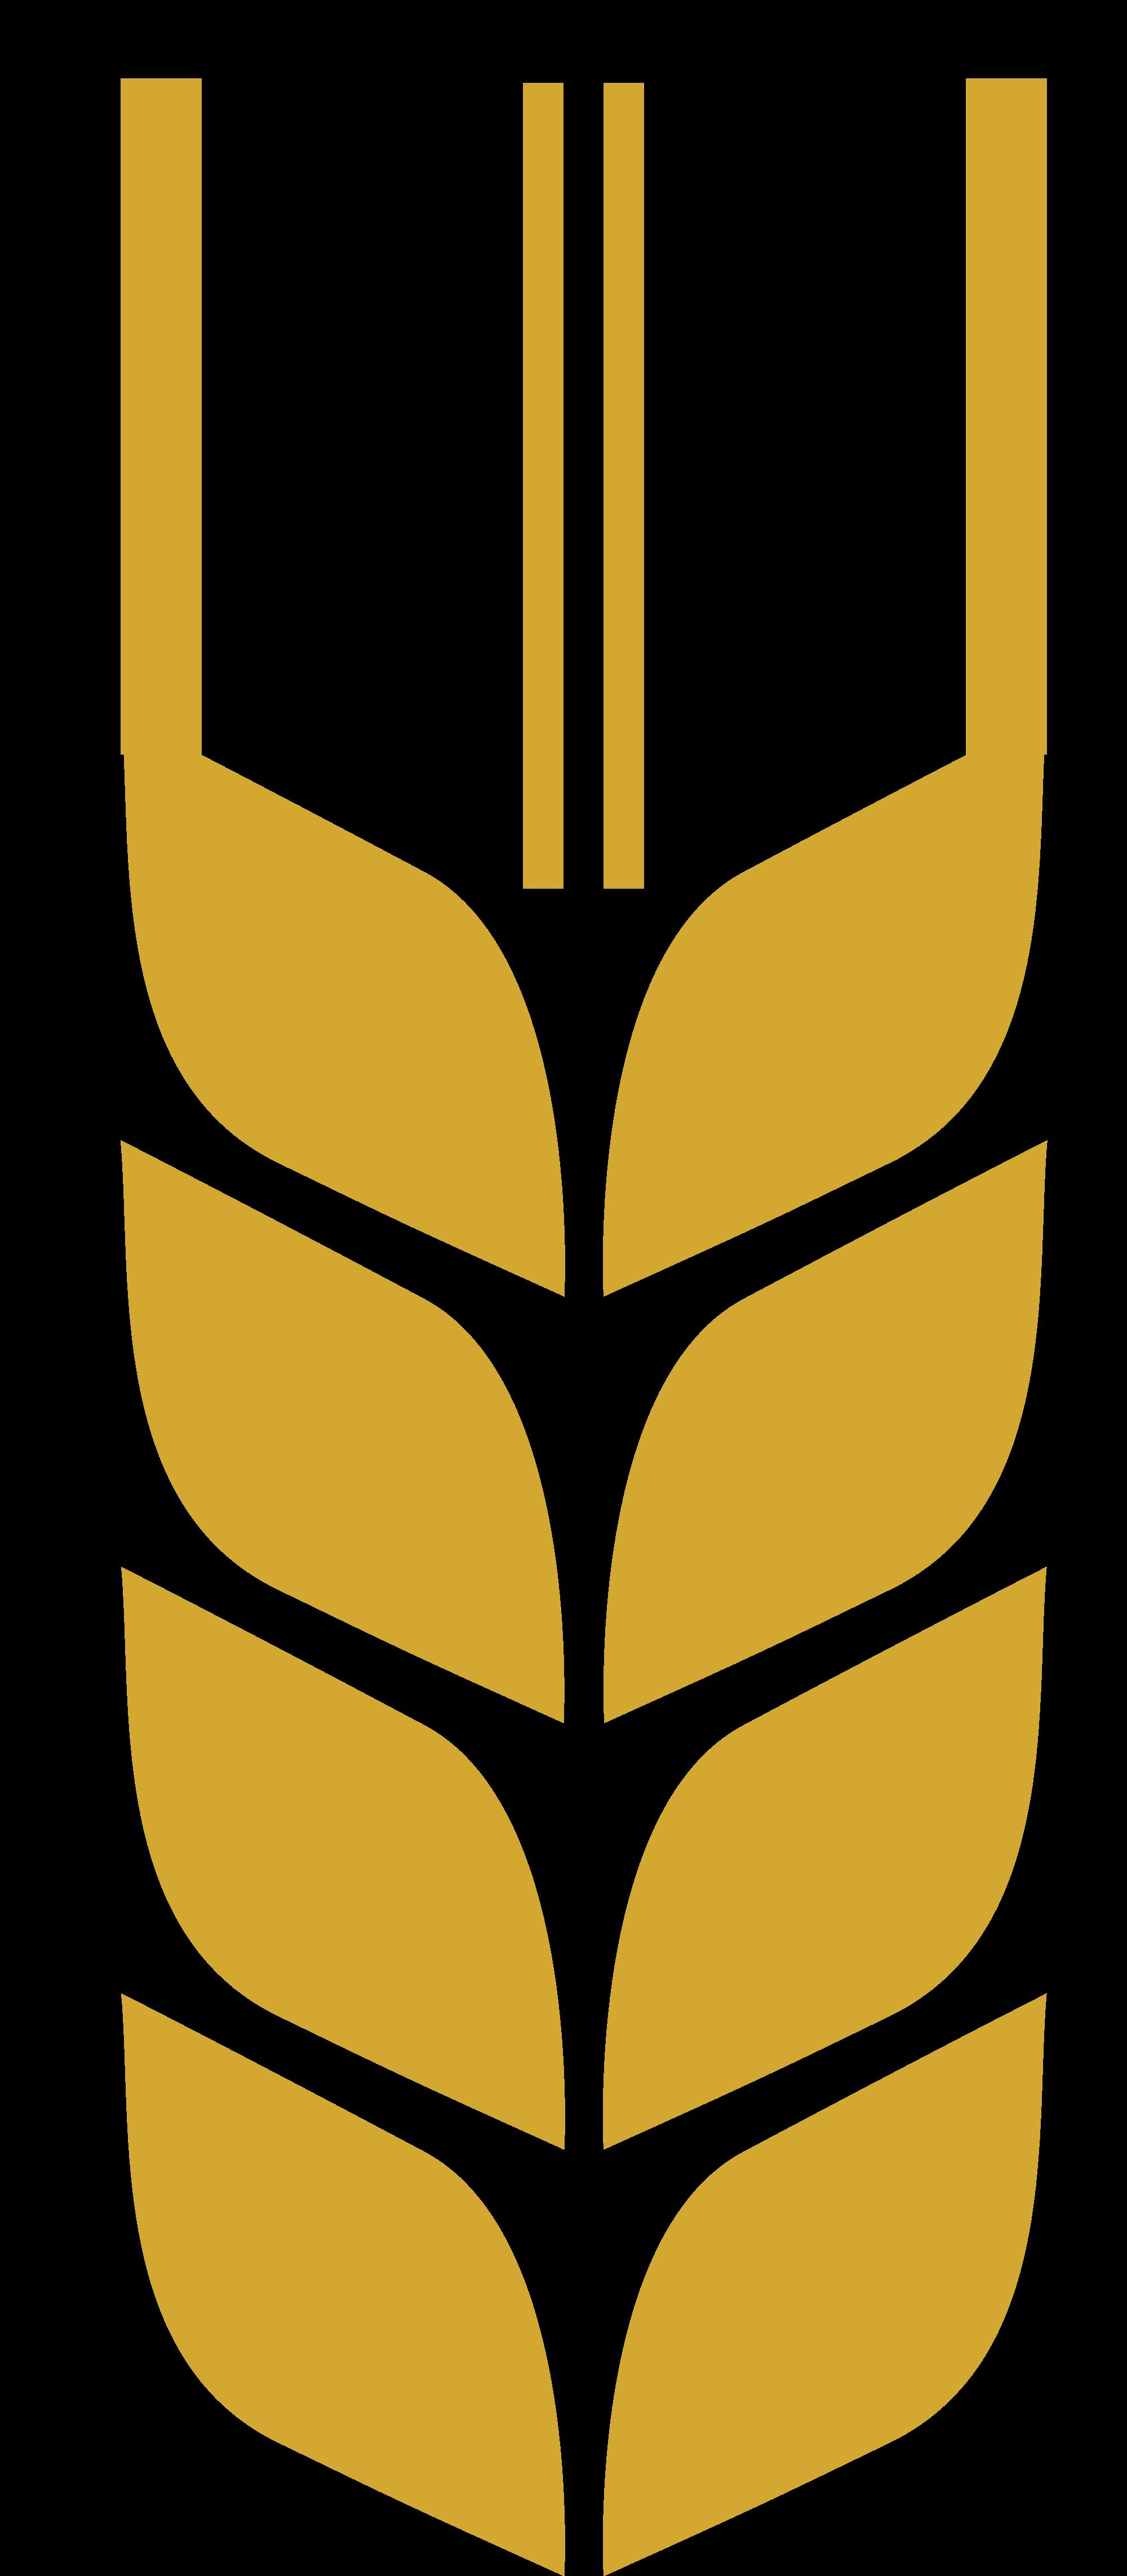 Wheat clipart svg. File icon wikimedia commons